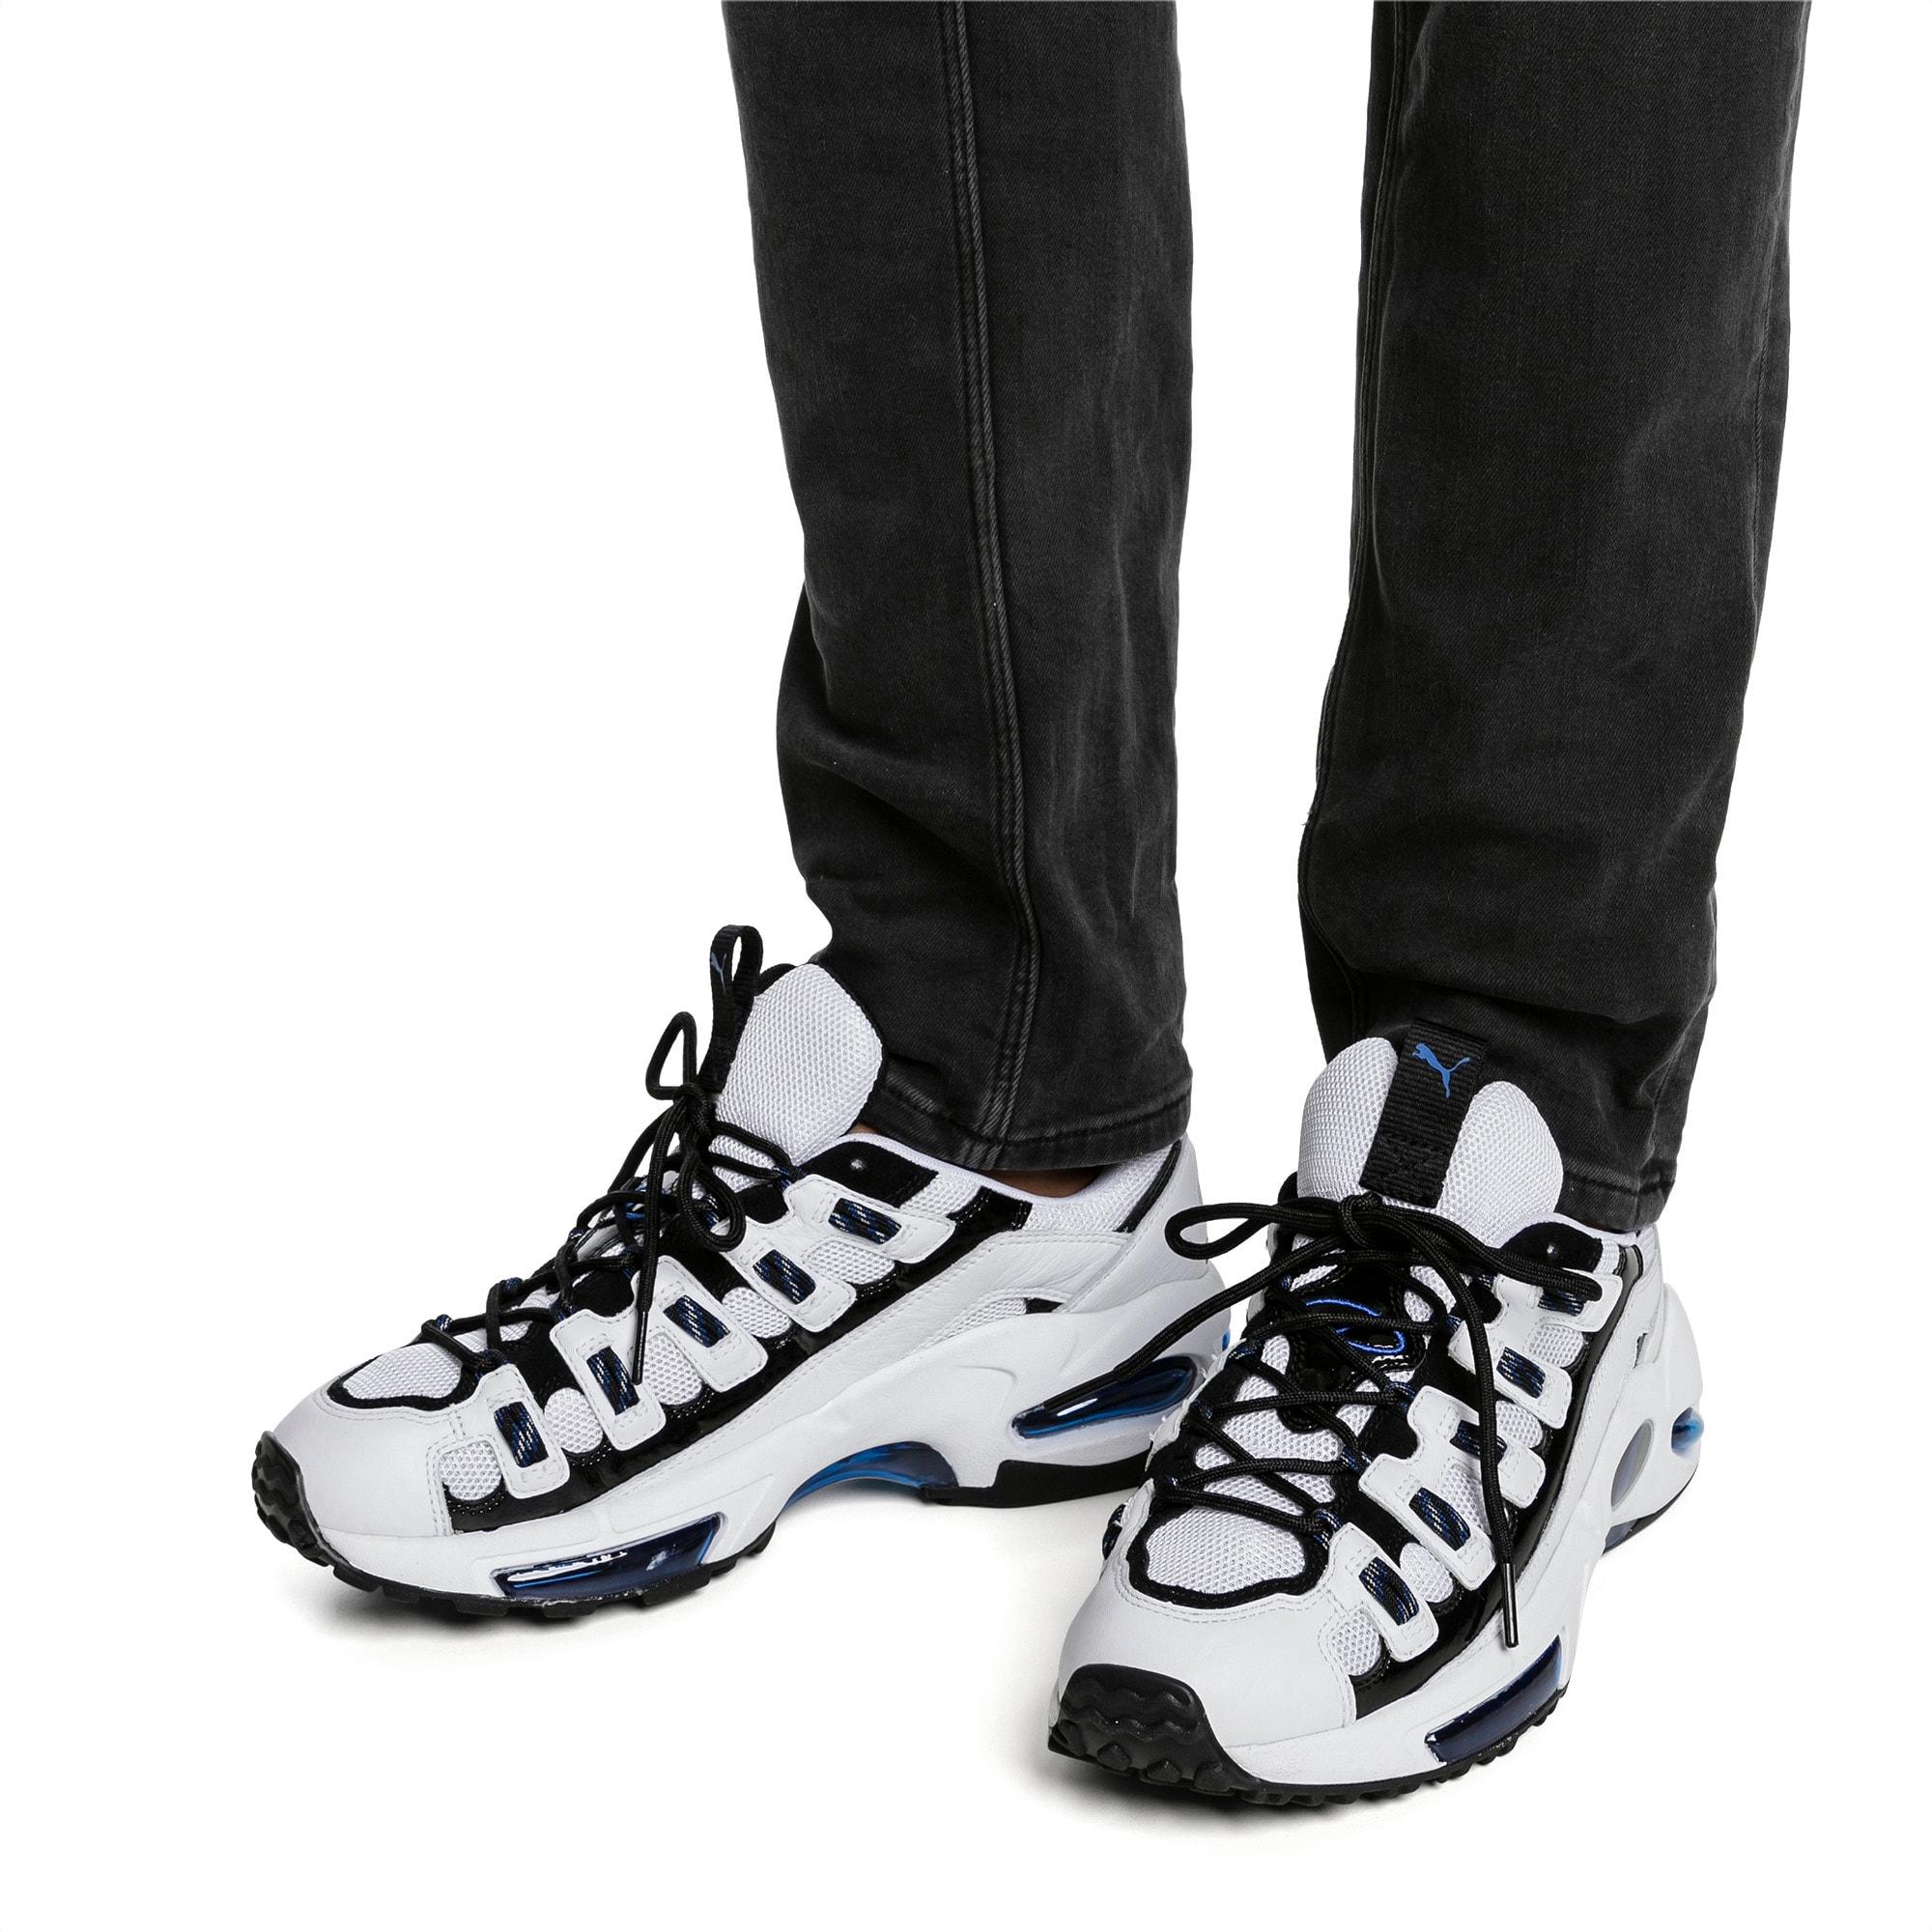 CELL Endura Patent 98 Men's Sneakers